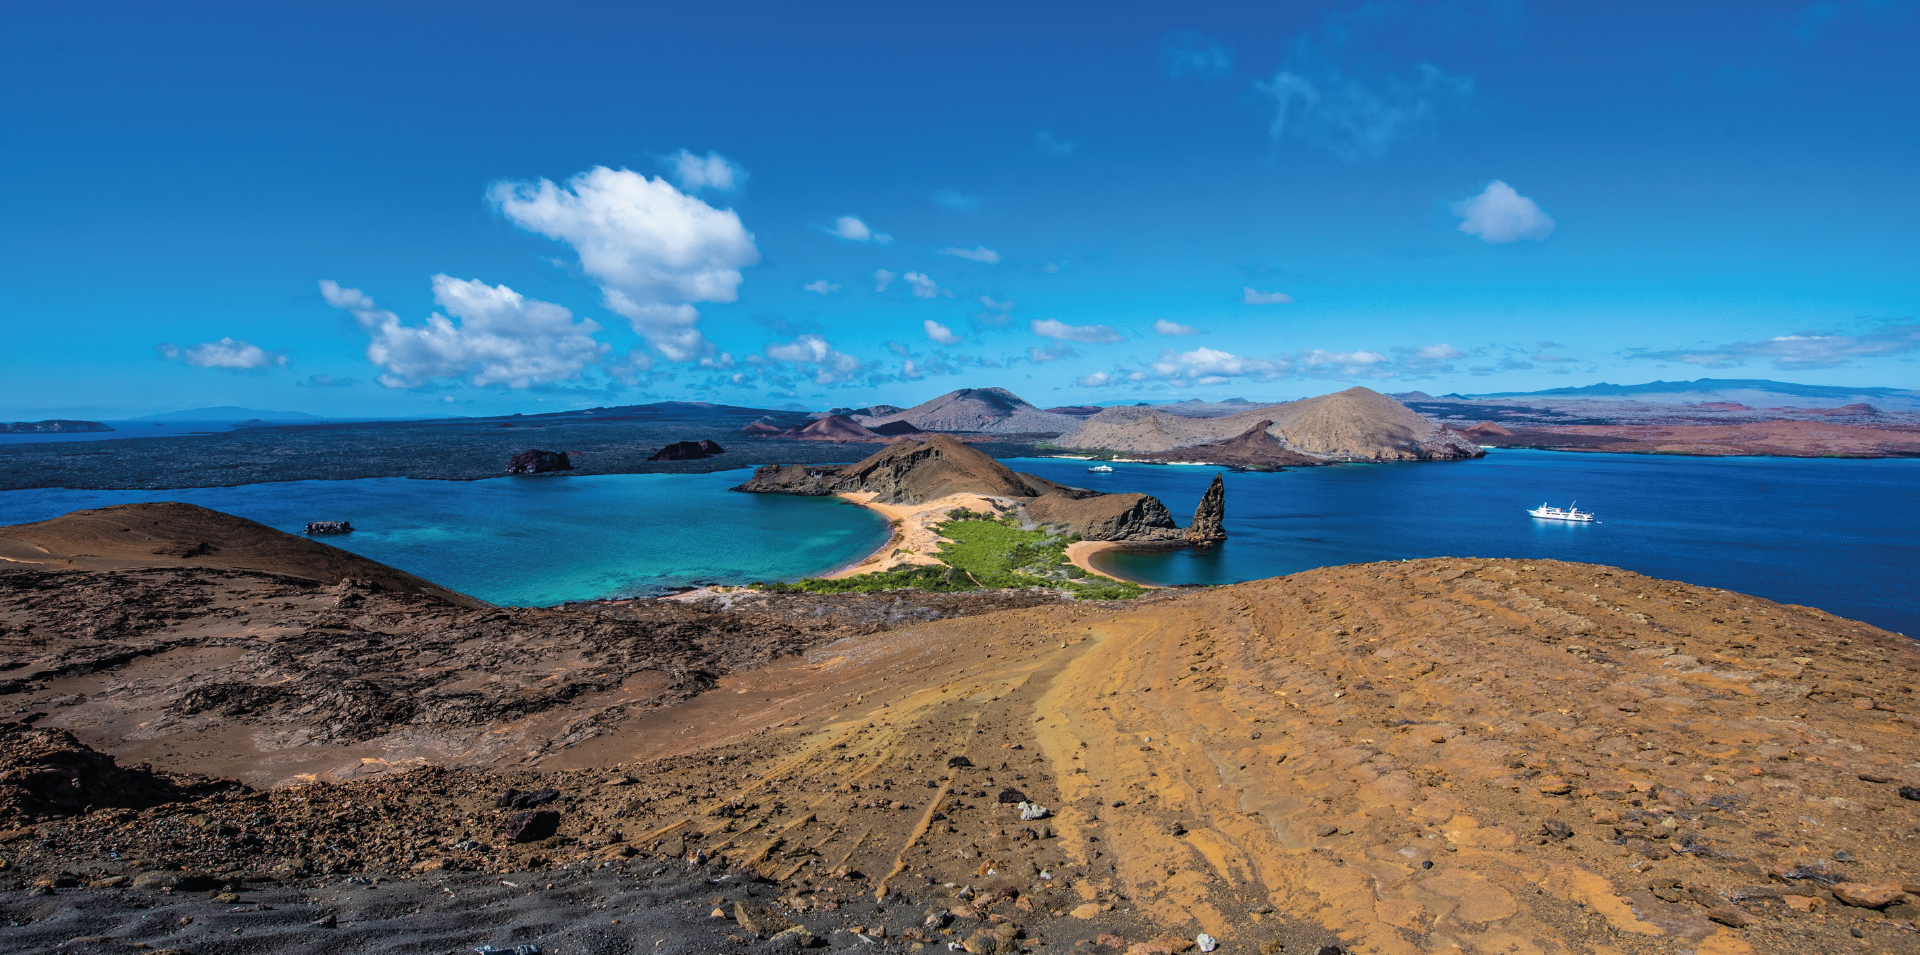 Galapagos Islands: Bartolome